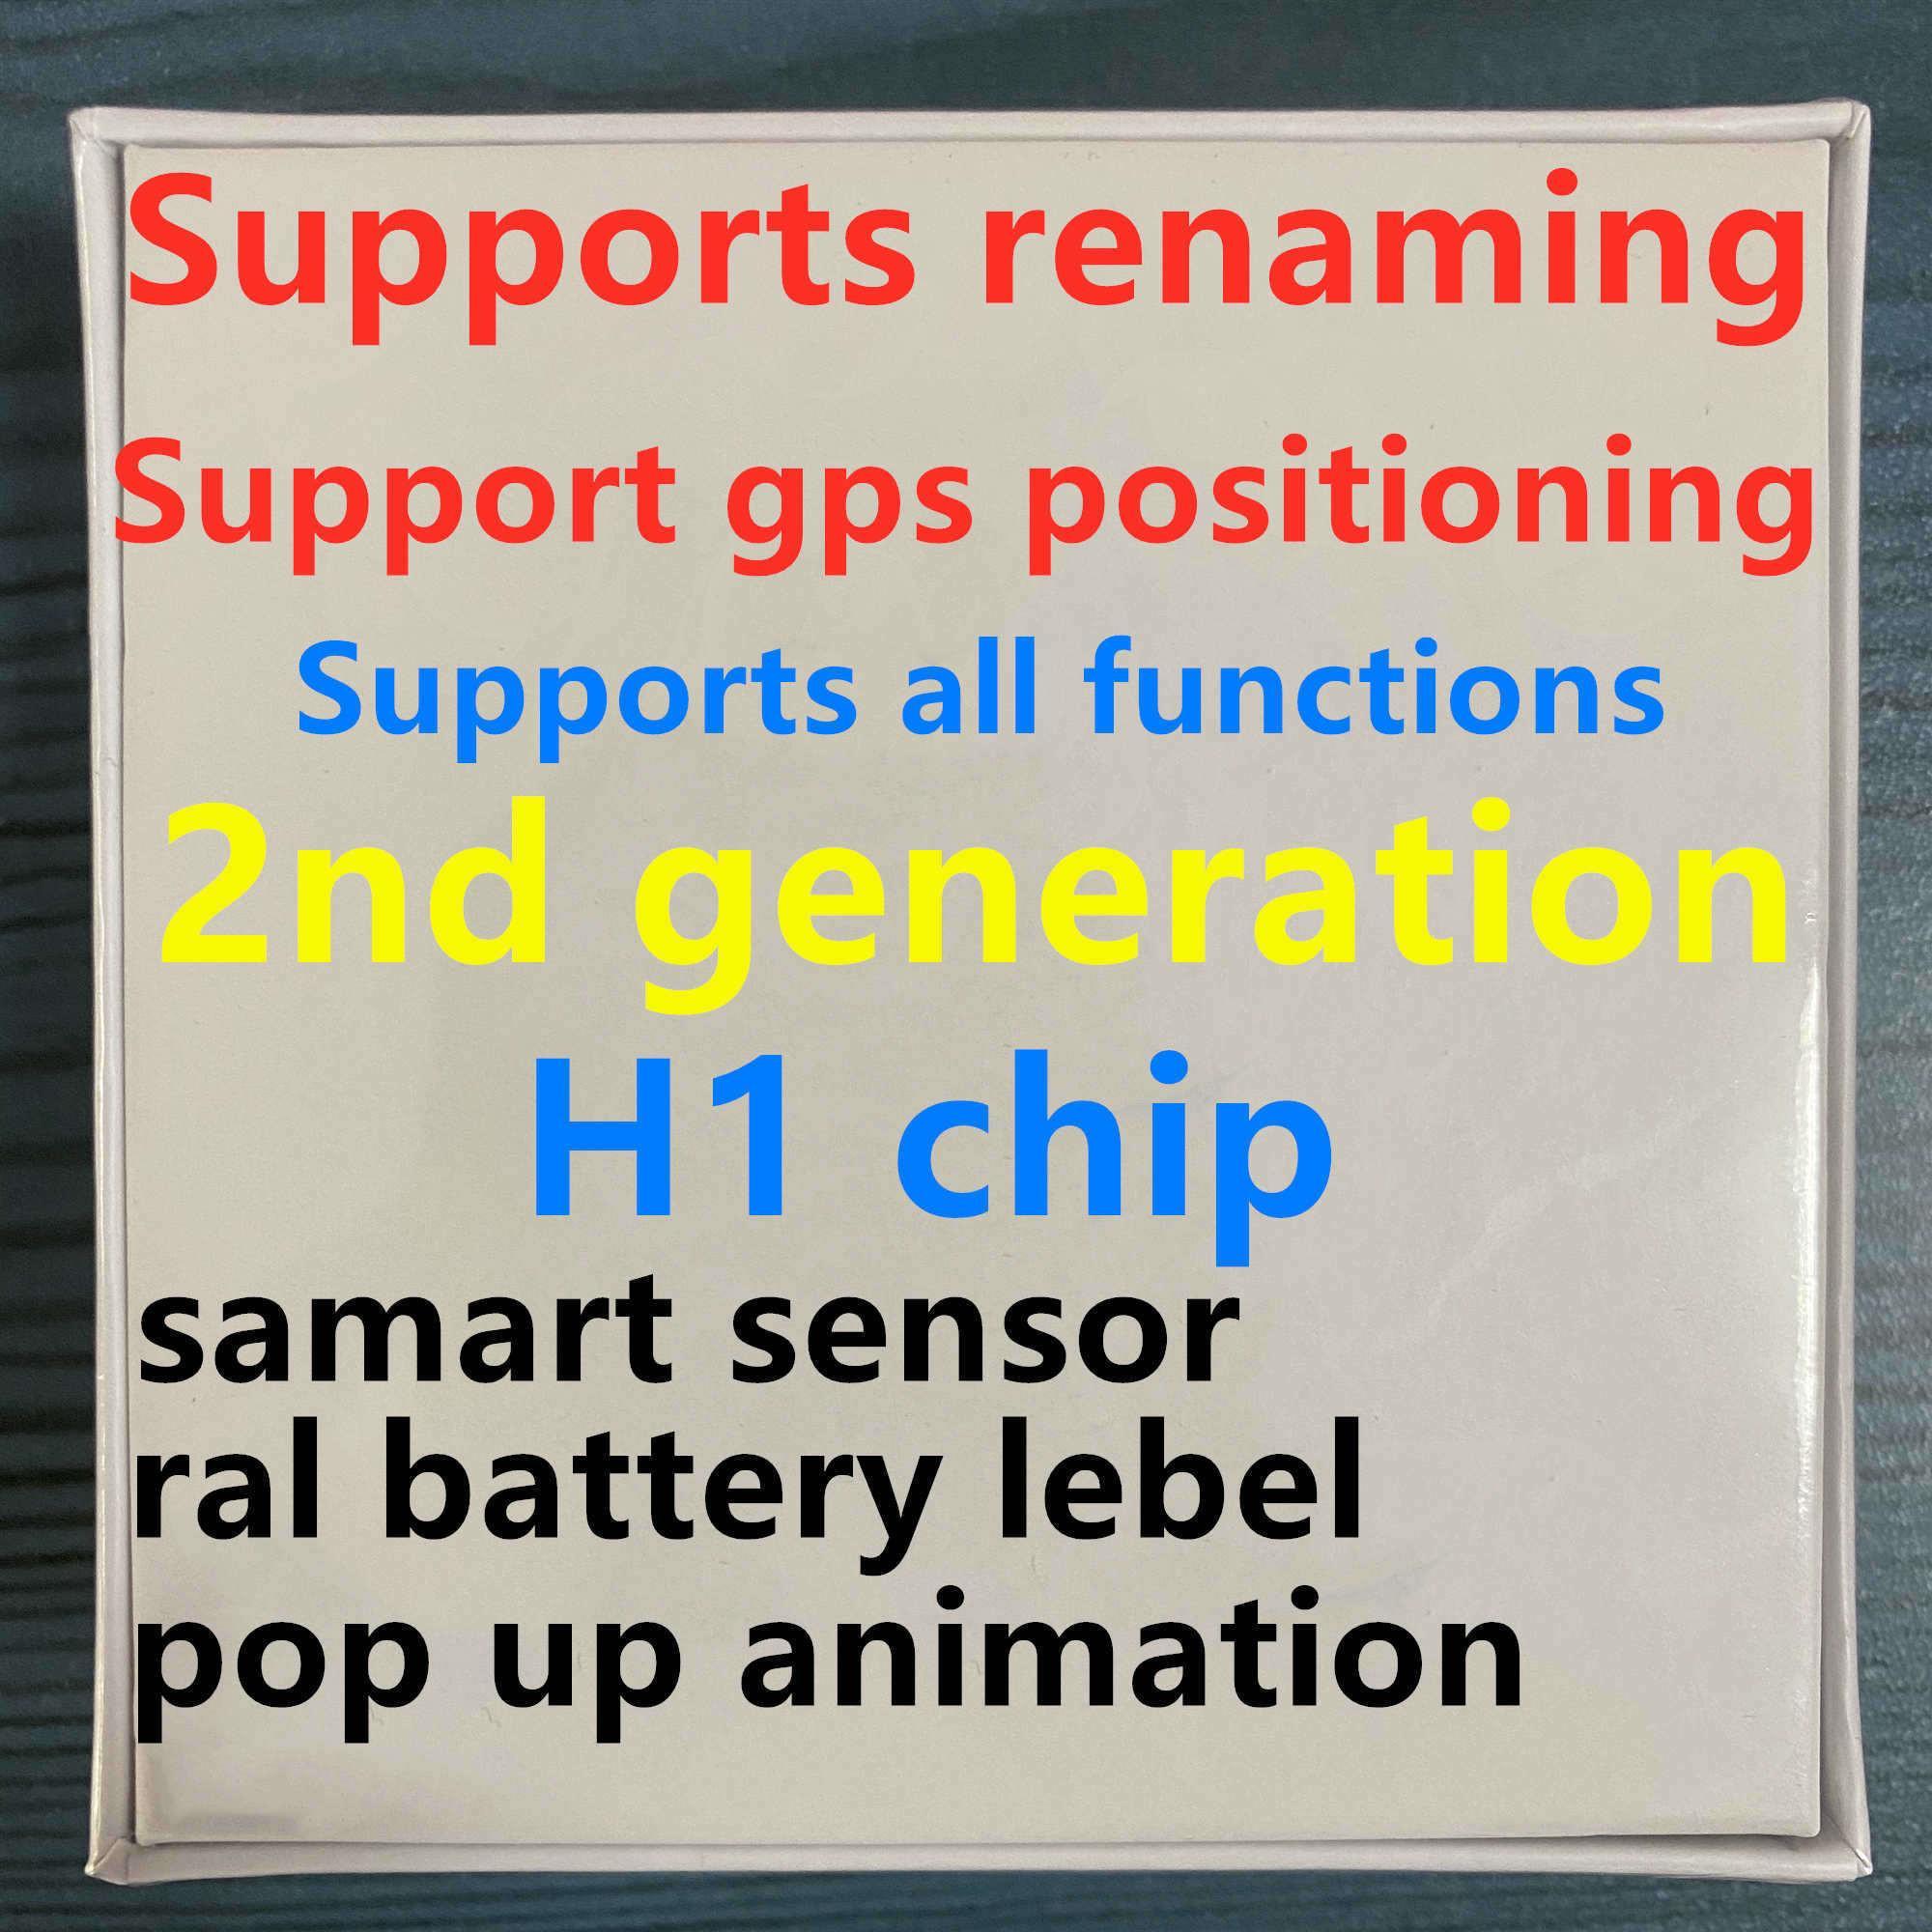 H1 칩 이어폰 GPS를 이름 바꾸기 에어 AP3 2 개 포드가 새로운 무선 충전 케이스 이어폰을 페어링 창 블루투스 헤드폰 자동 팝업 AP2 TWS 세대 프로